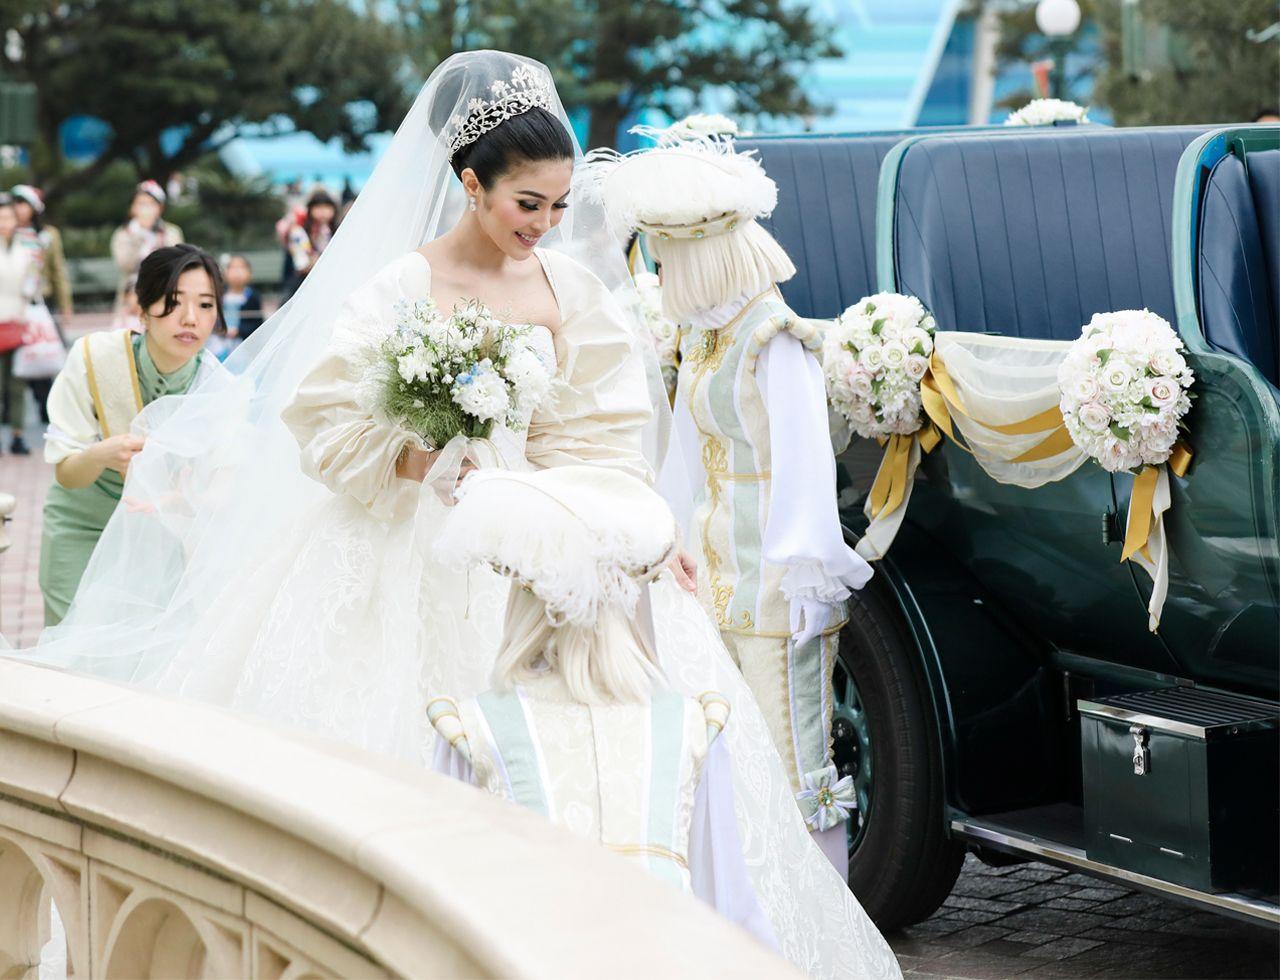 harvey moeis & sandra dewi | axioo – wedding photography